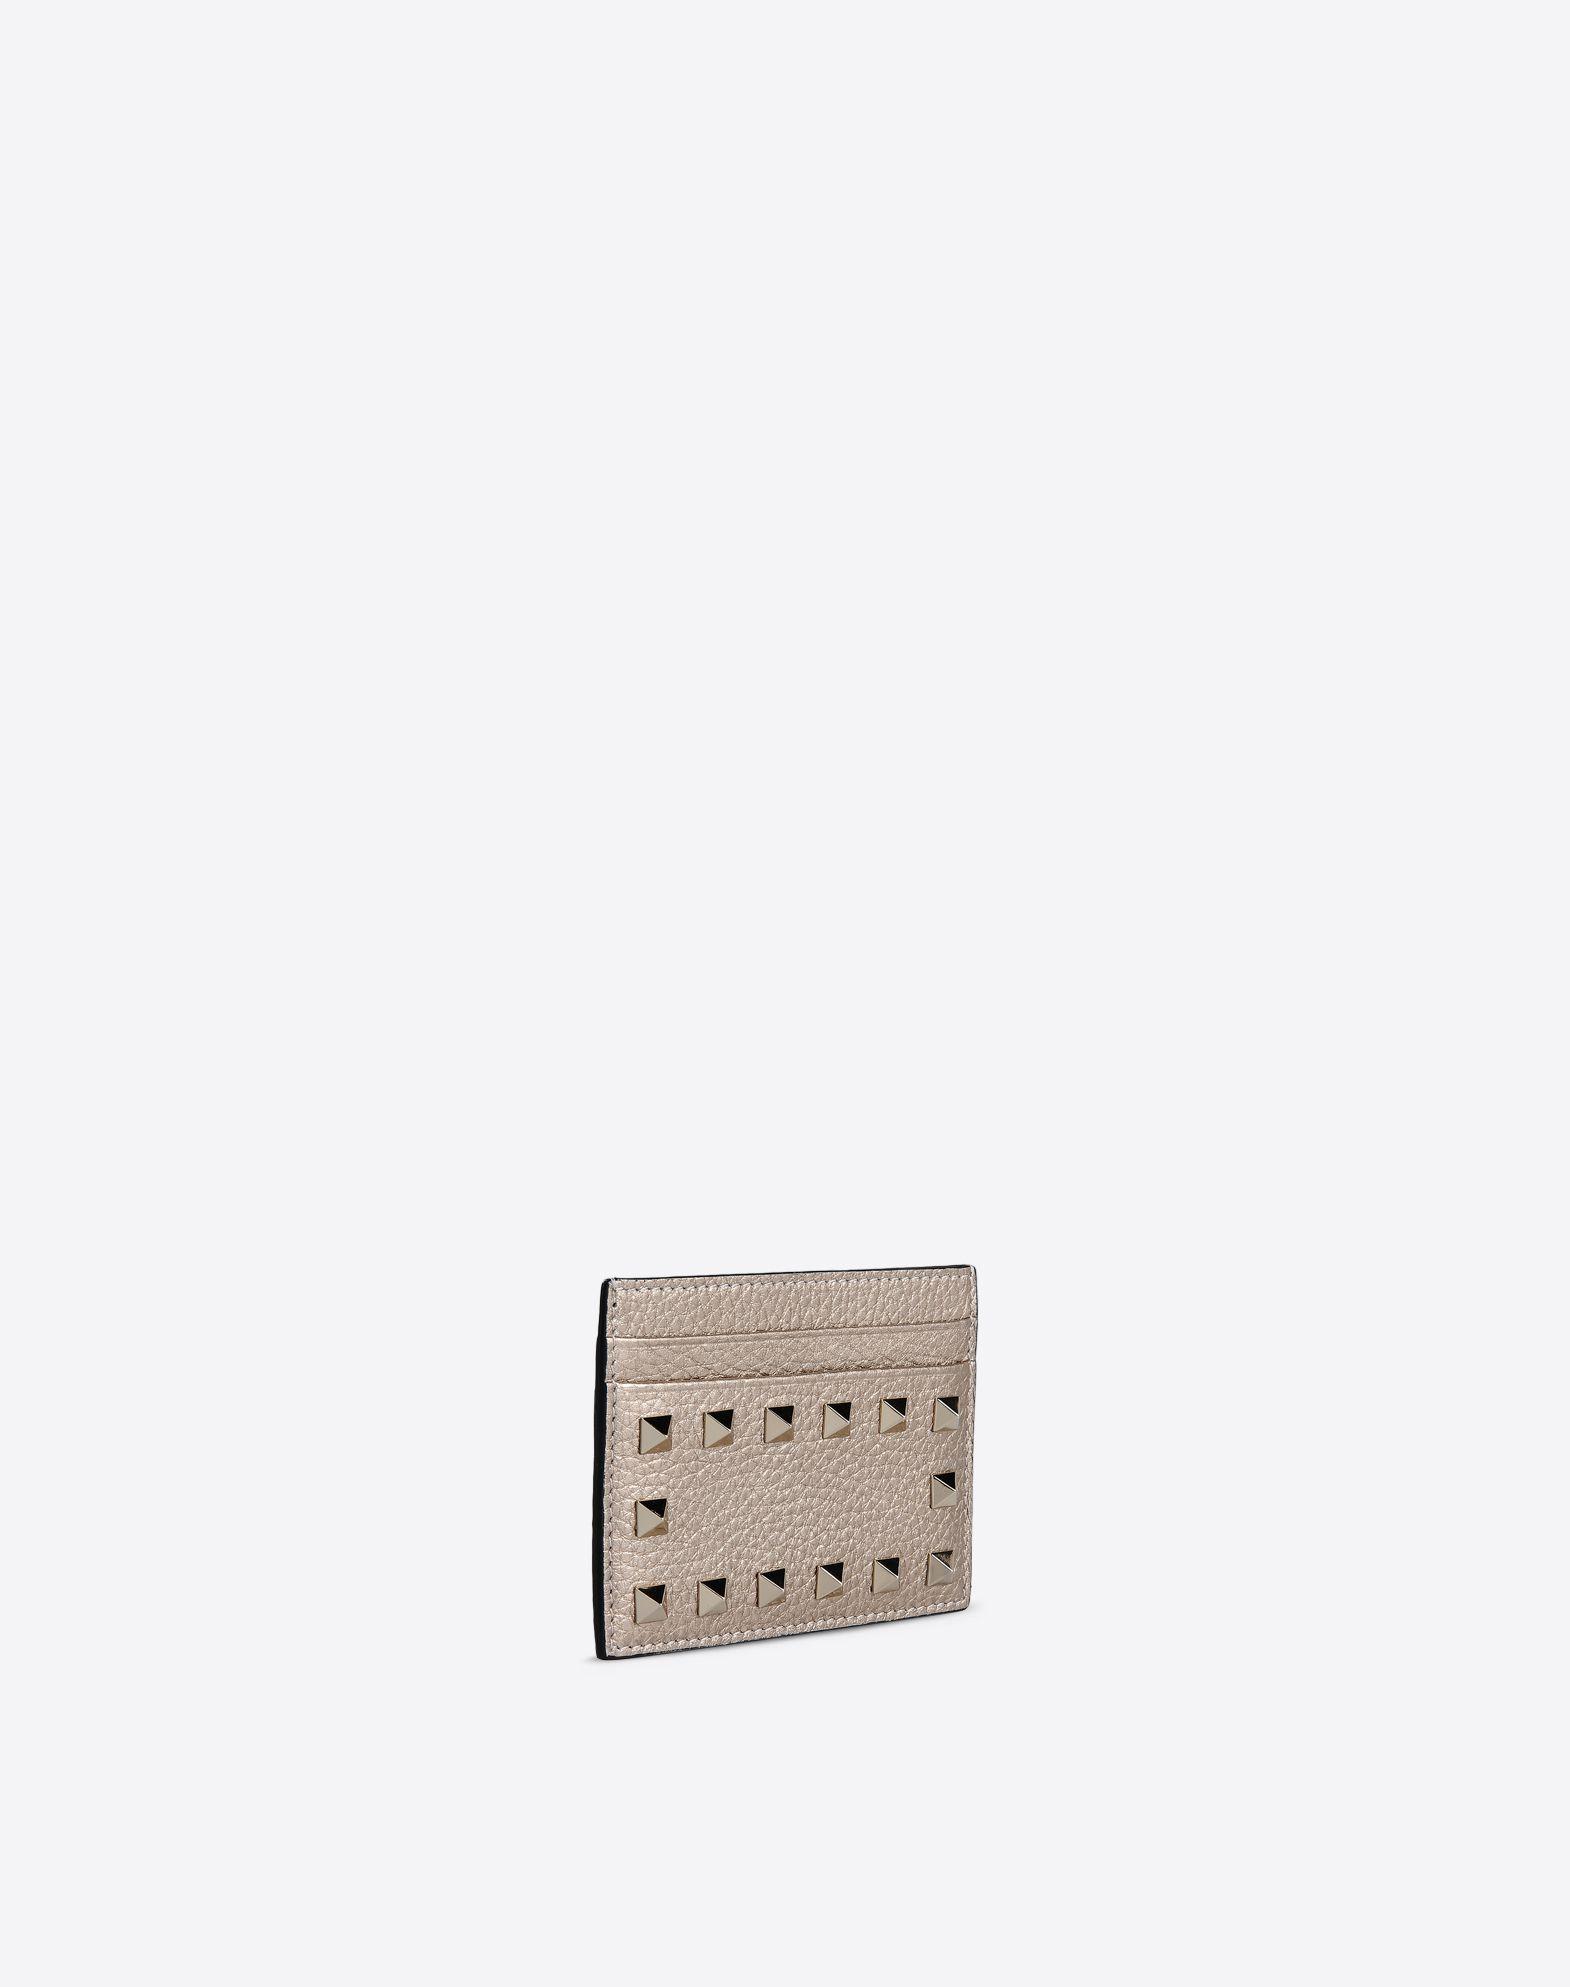 VALENTINO GARAVANI Rockstud Card Holder COIN PURSES & CARD CASES D r